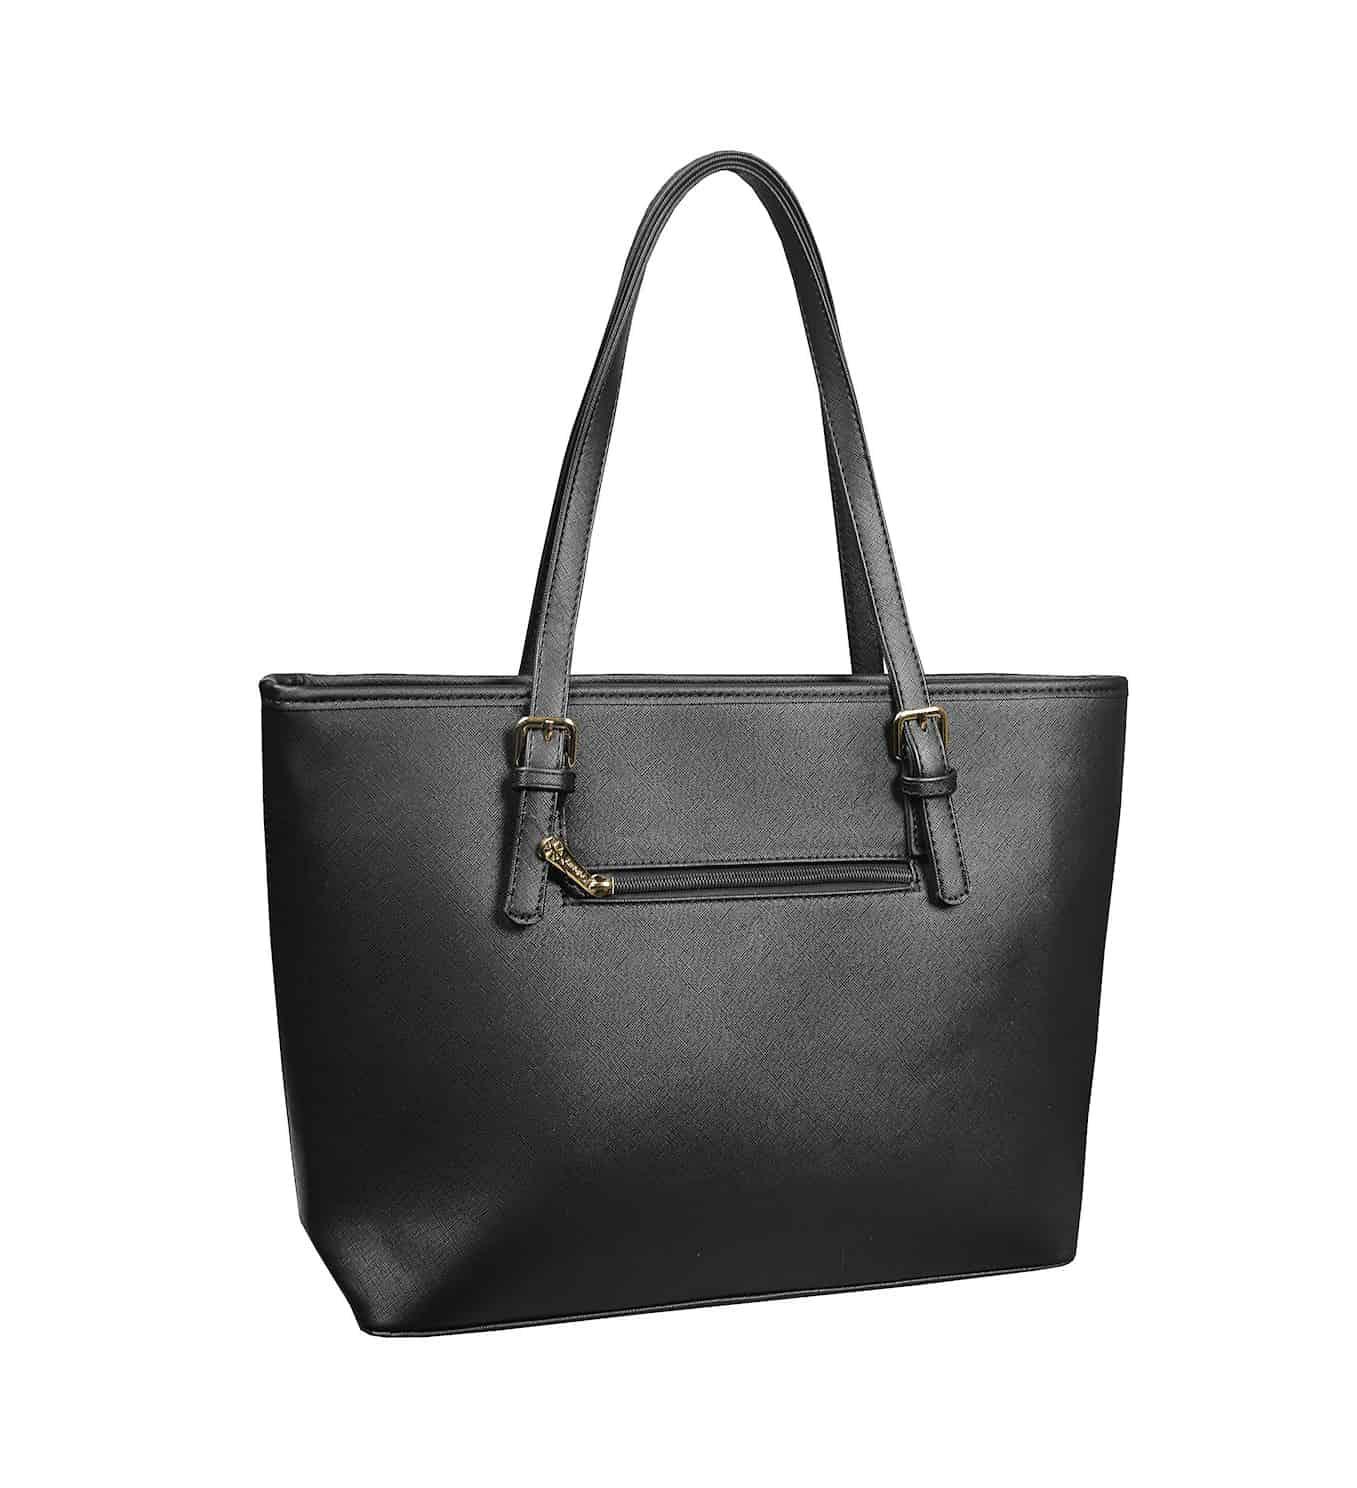 sac a main noir pas cher